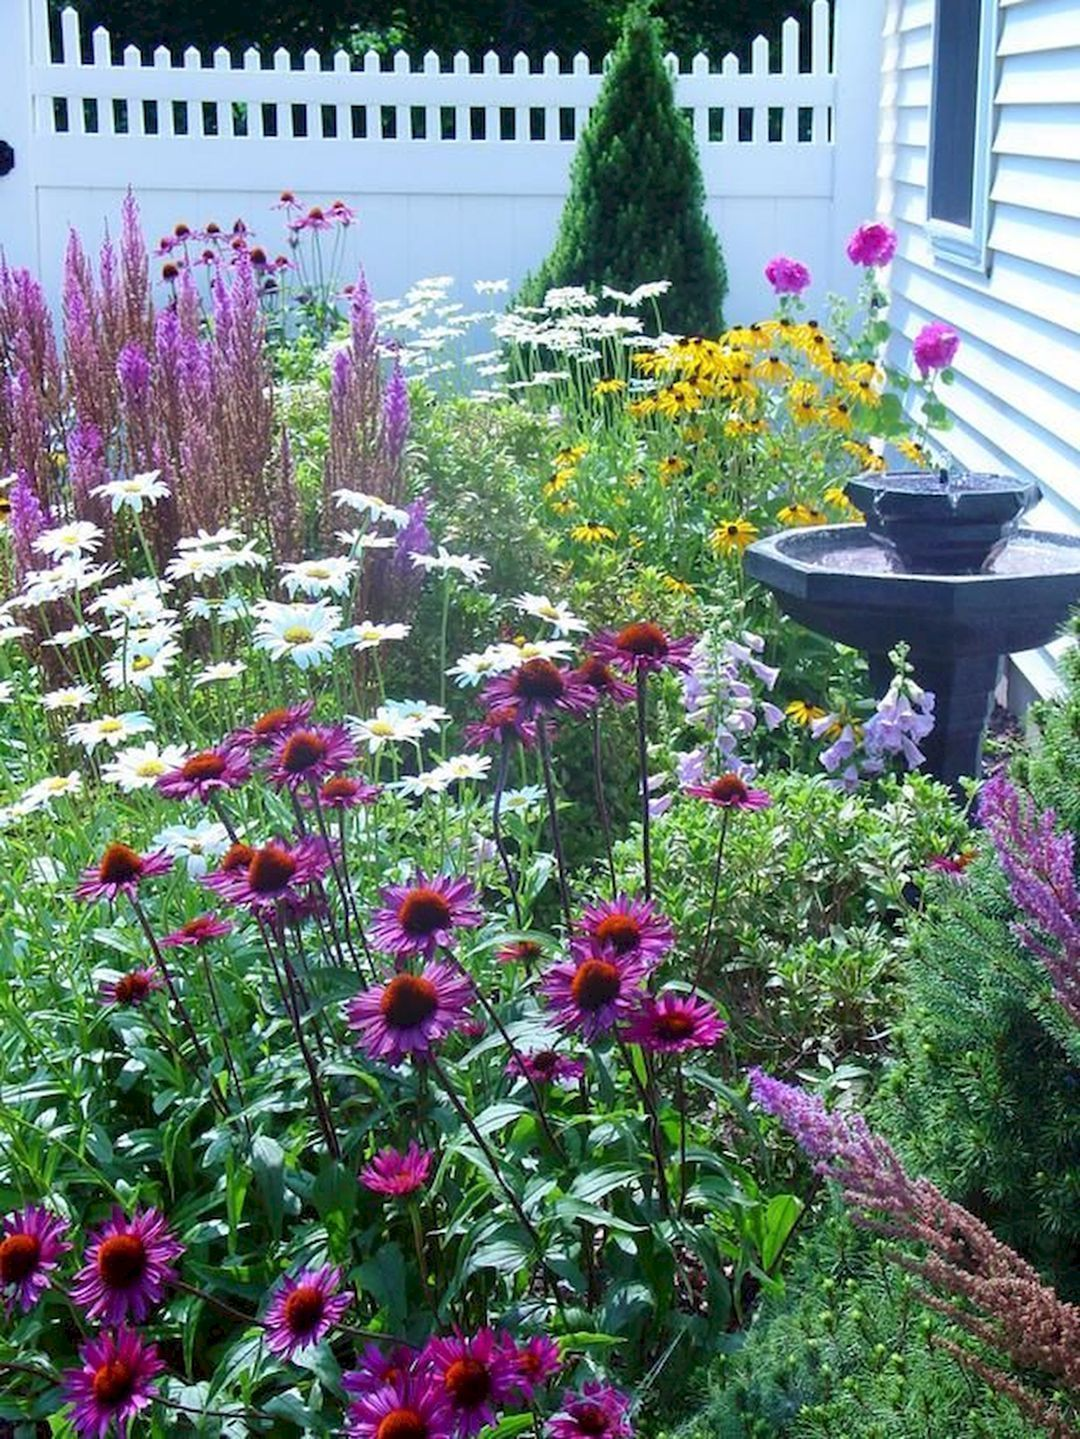 Pin by Rachel Melville on Gardens | Pinterest | Backyard, Gardens ...